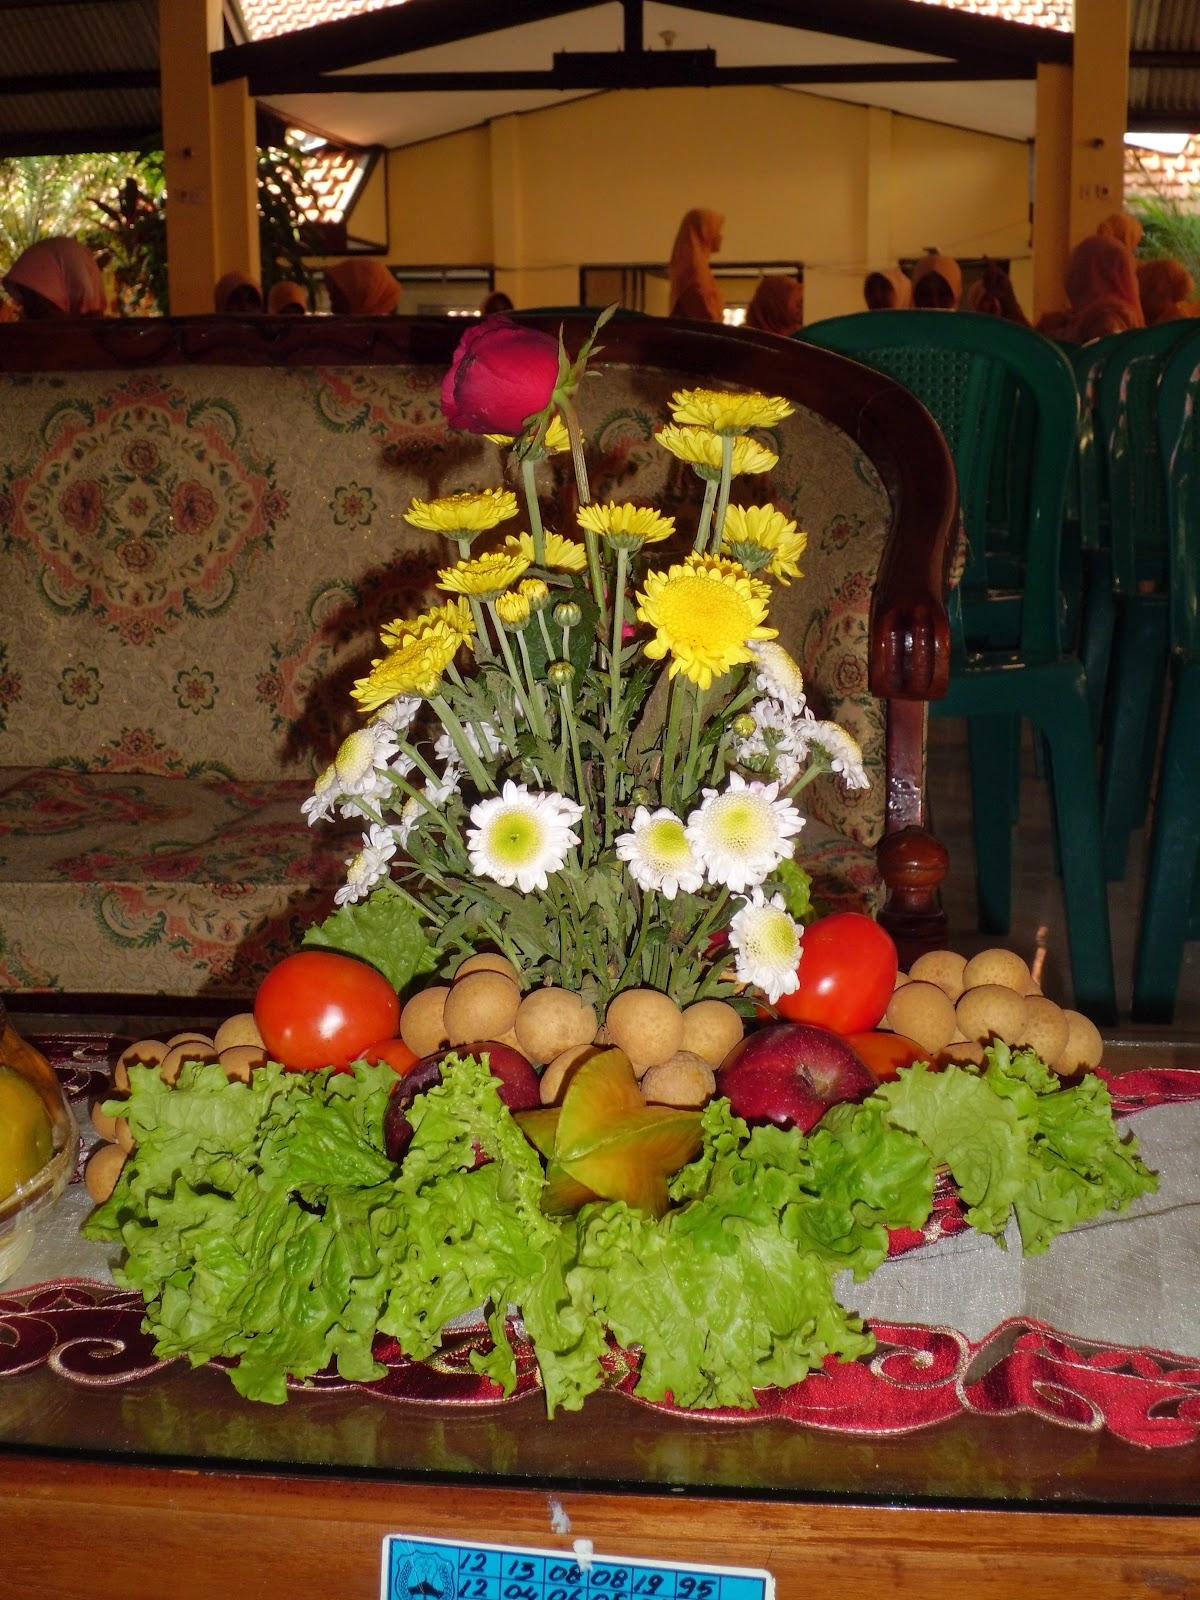 Kreasi Seni Budaya Merangkai Bunga